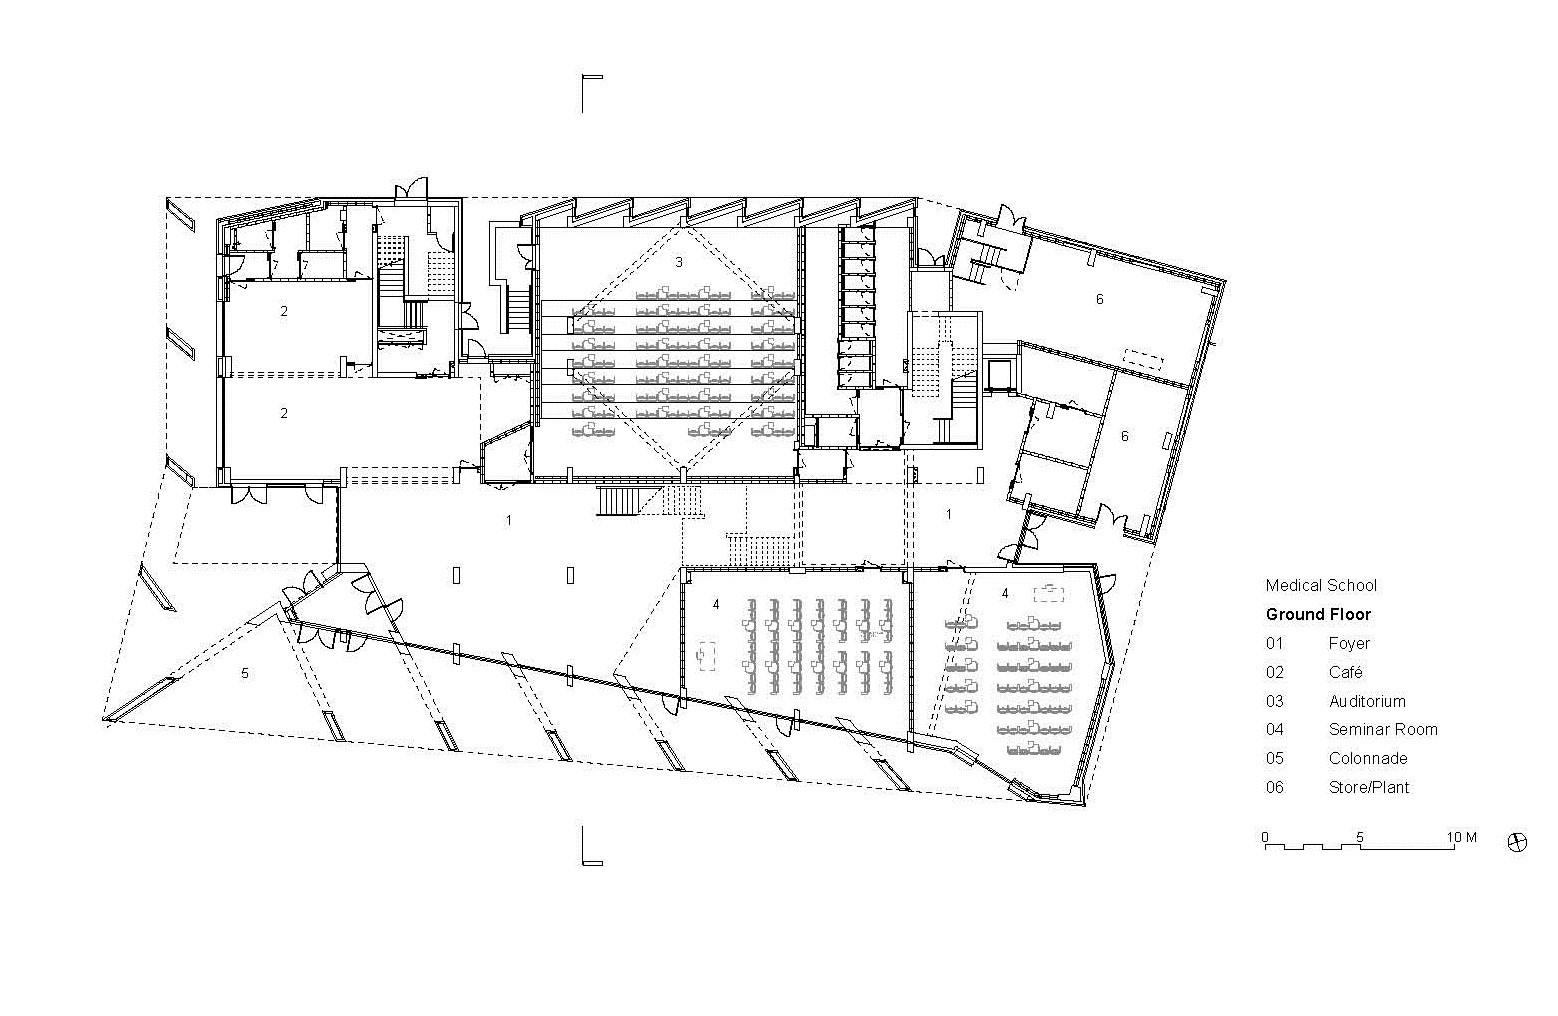 Sage Floor Plan Gallery Of University Of Limerick Medical School Grafton